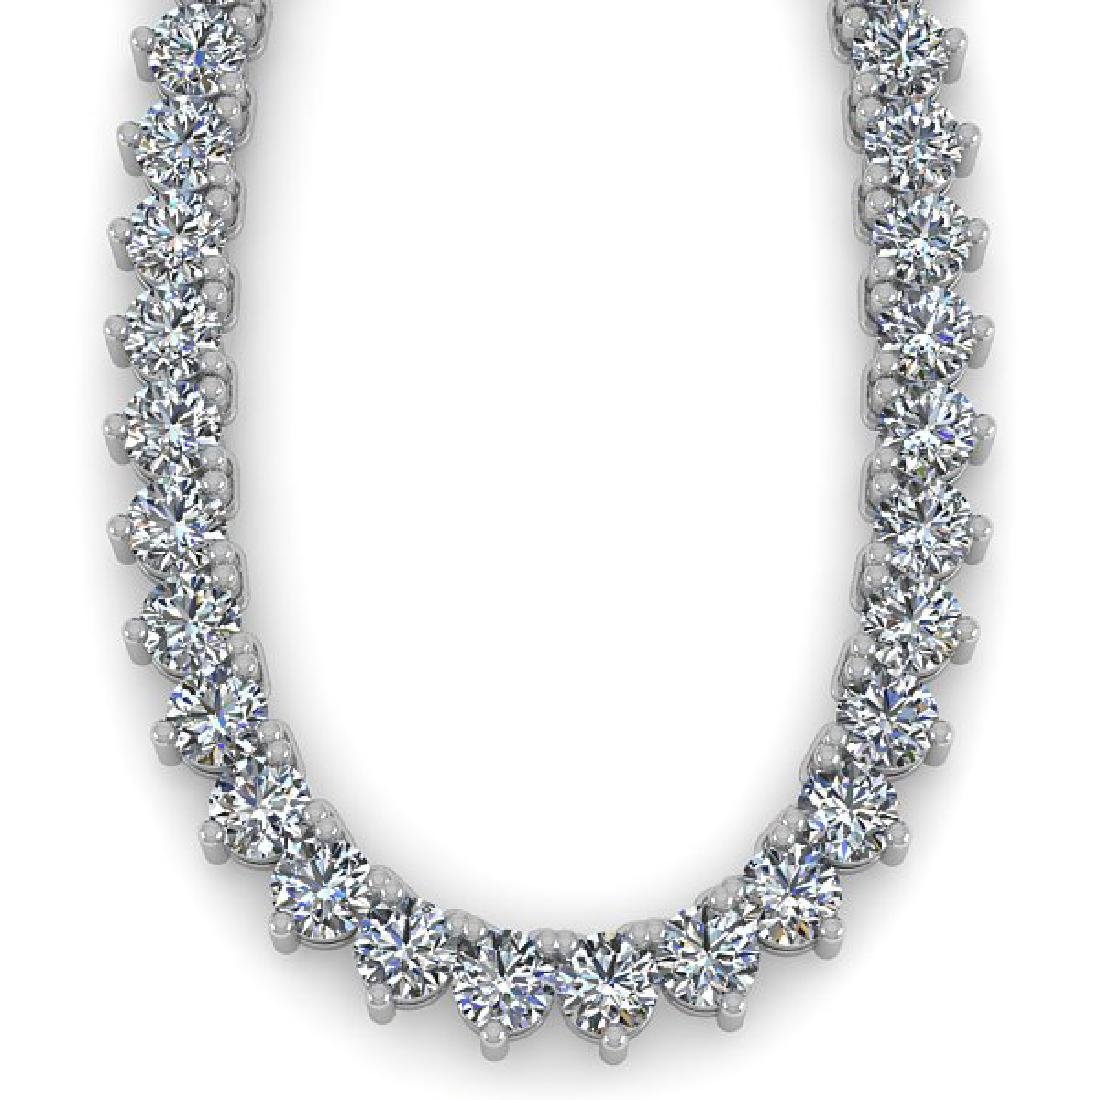 38 CTW Solitaire SI Diamond Necklace 14K White Gold - 2